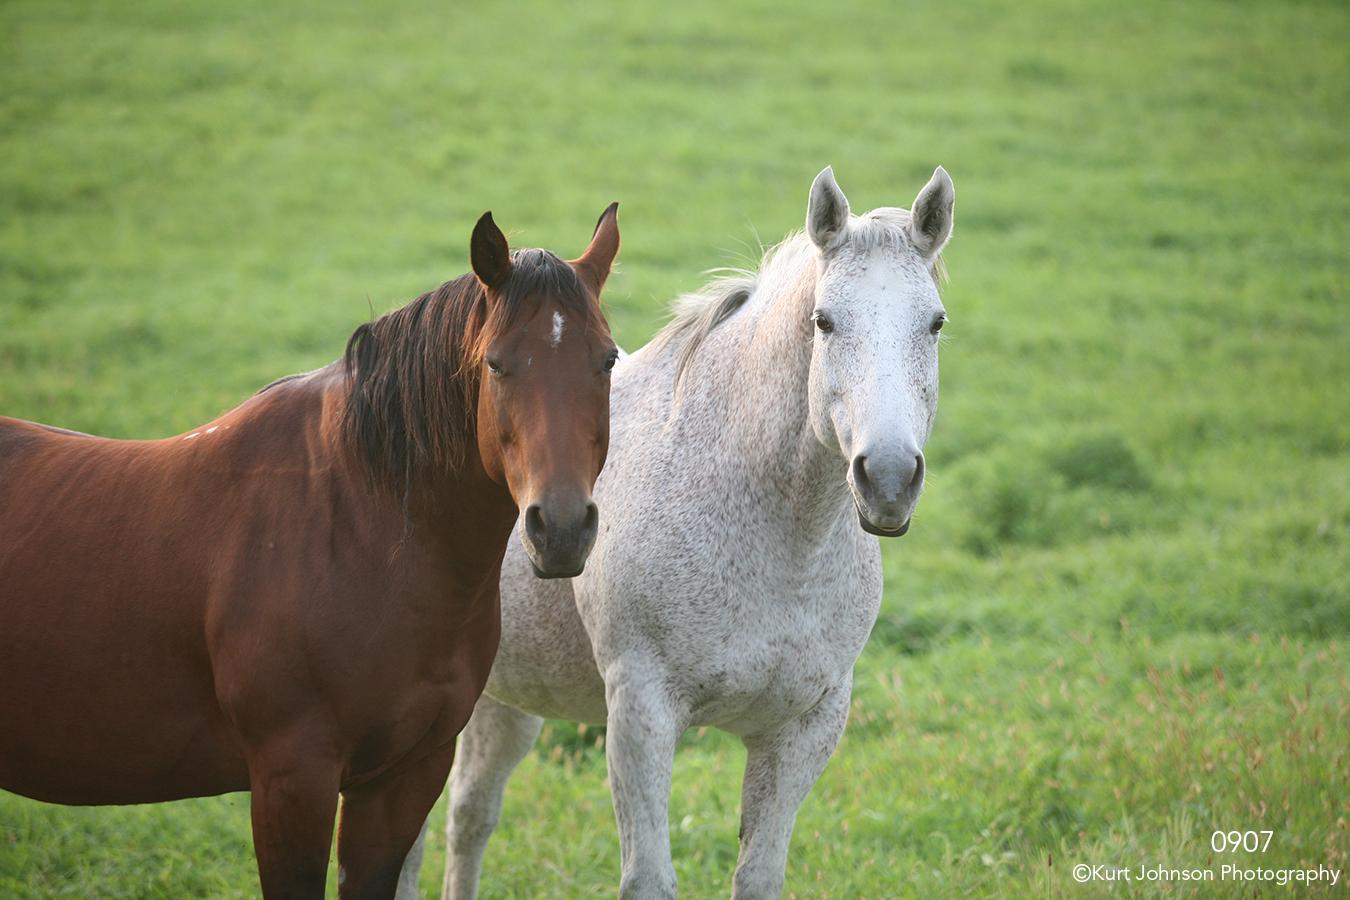 animals horses wildlife grasses green